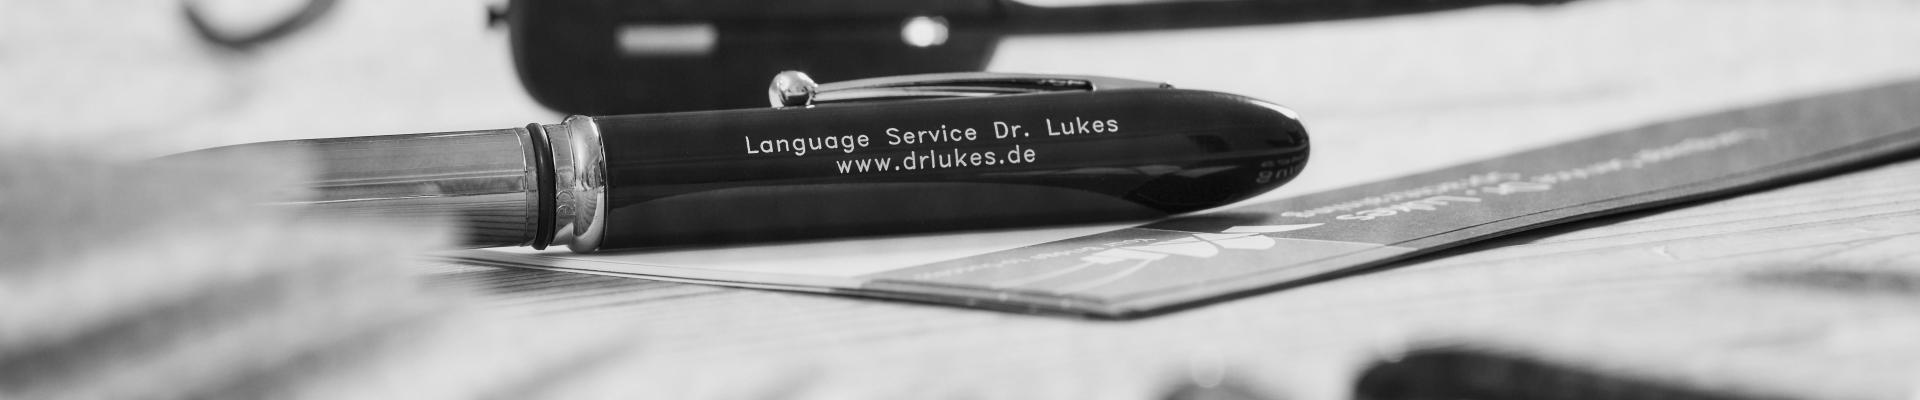 Language Service Dr. Lukes